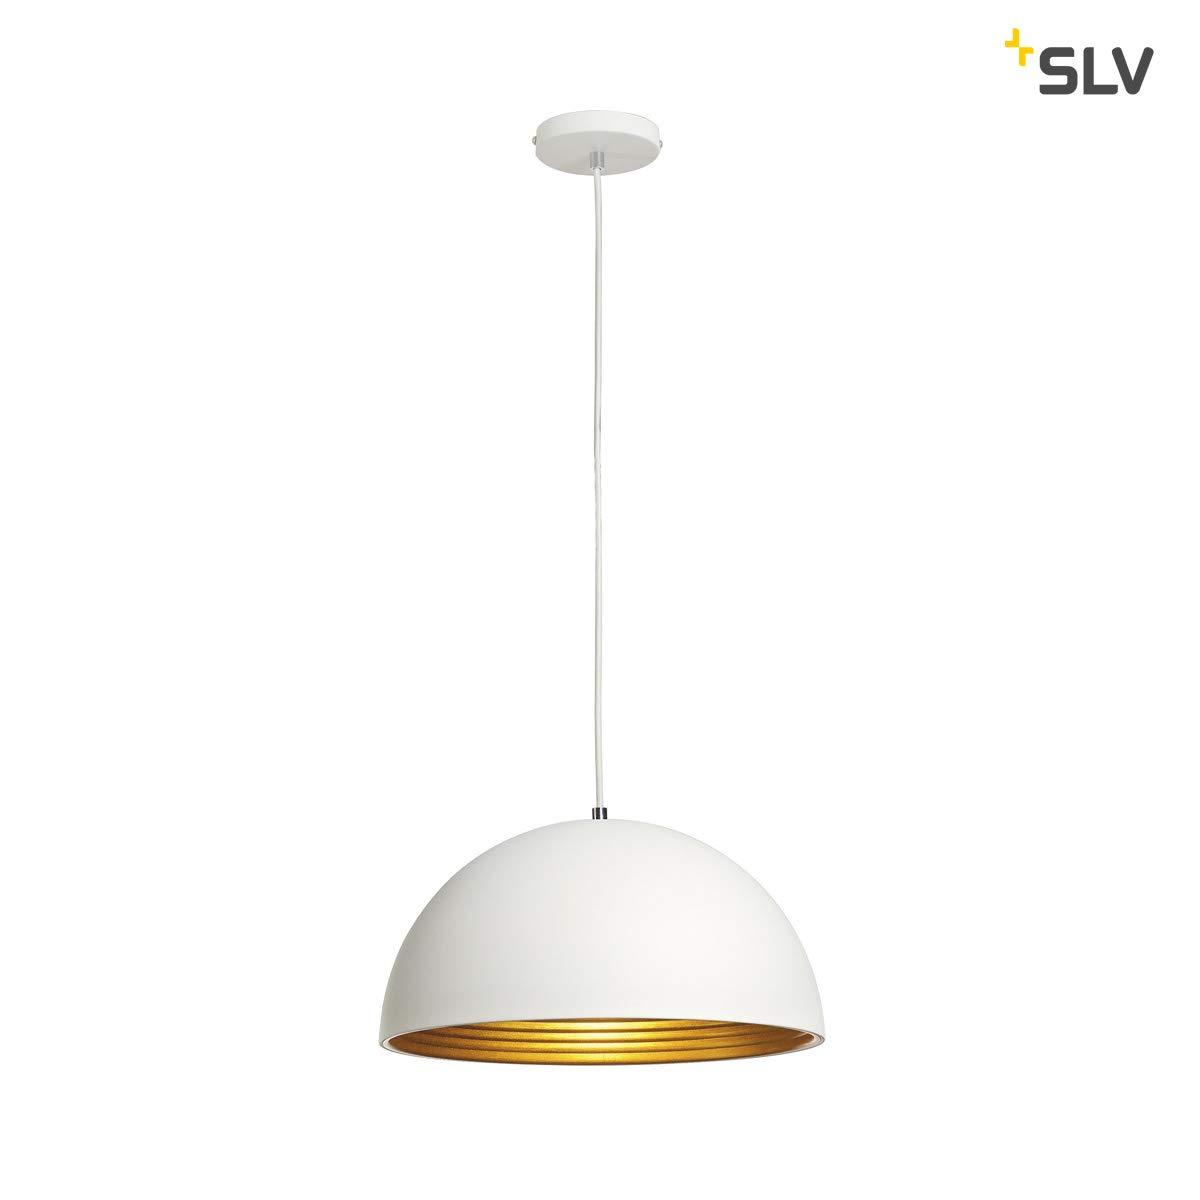 SLV 155911 SLV FORCHINI M 吊灯 PD-2 40cm 圆形白金 E27 *大值 40W,铝,白/金,